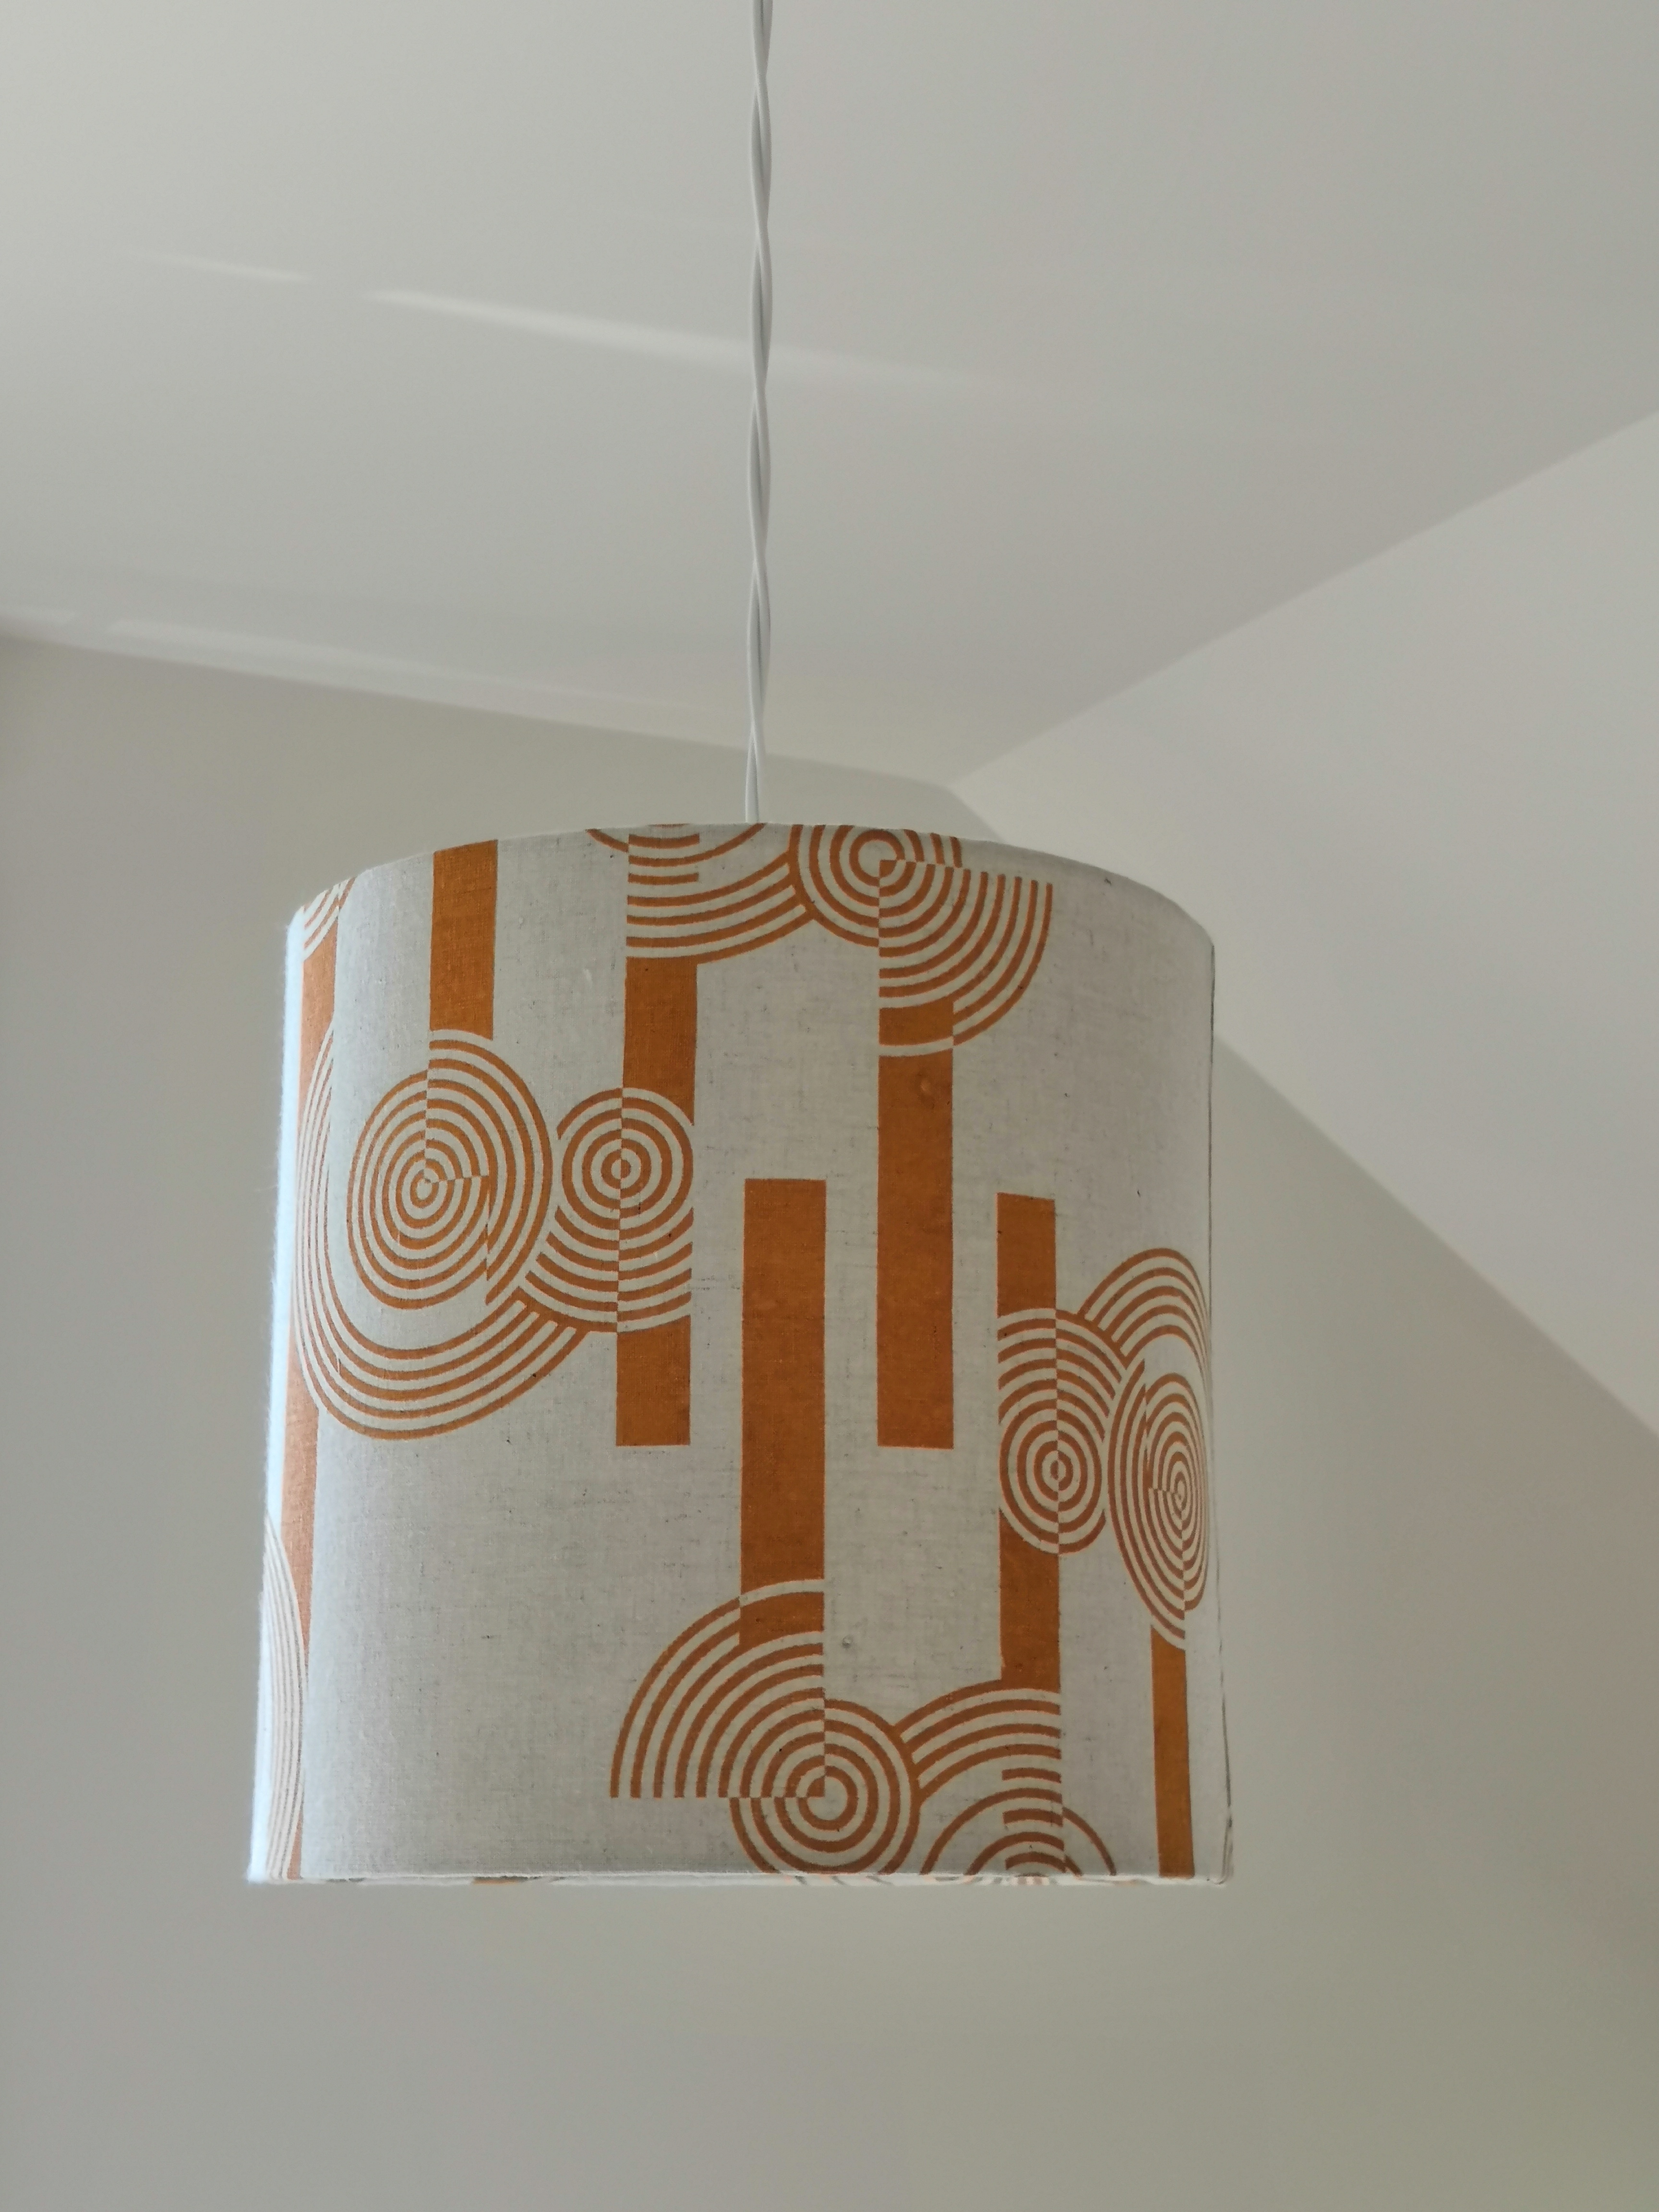 Concentric Circles Lampshade 23x23cm